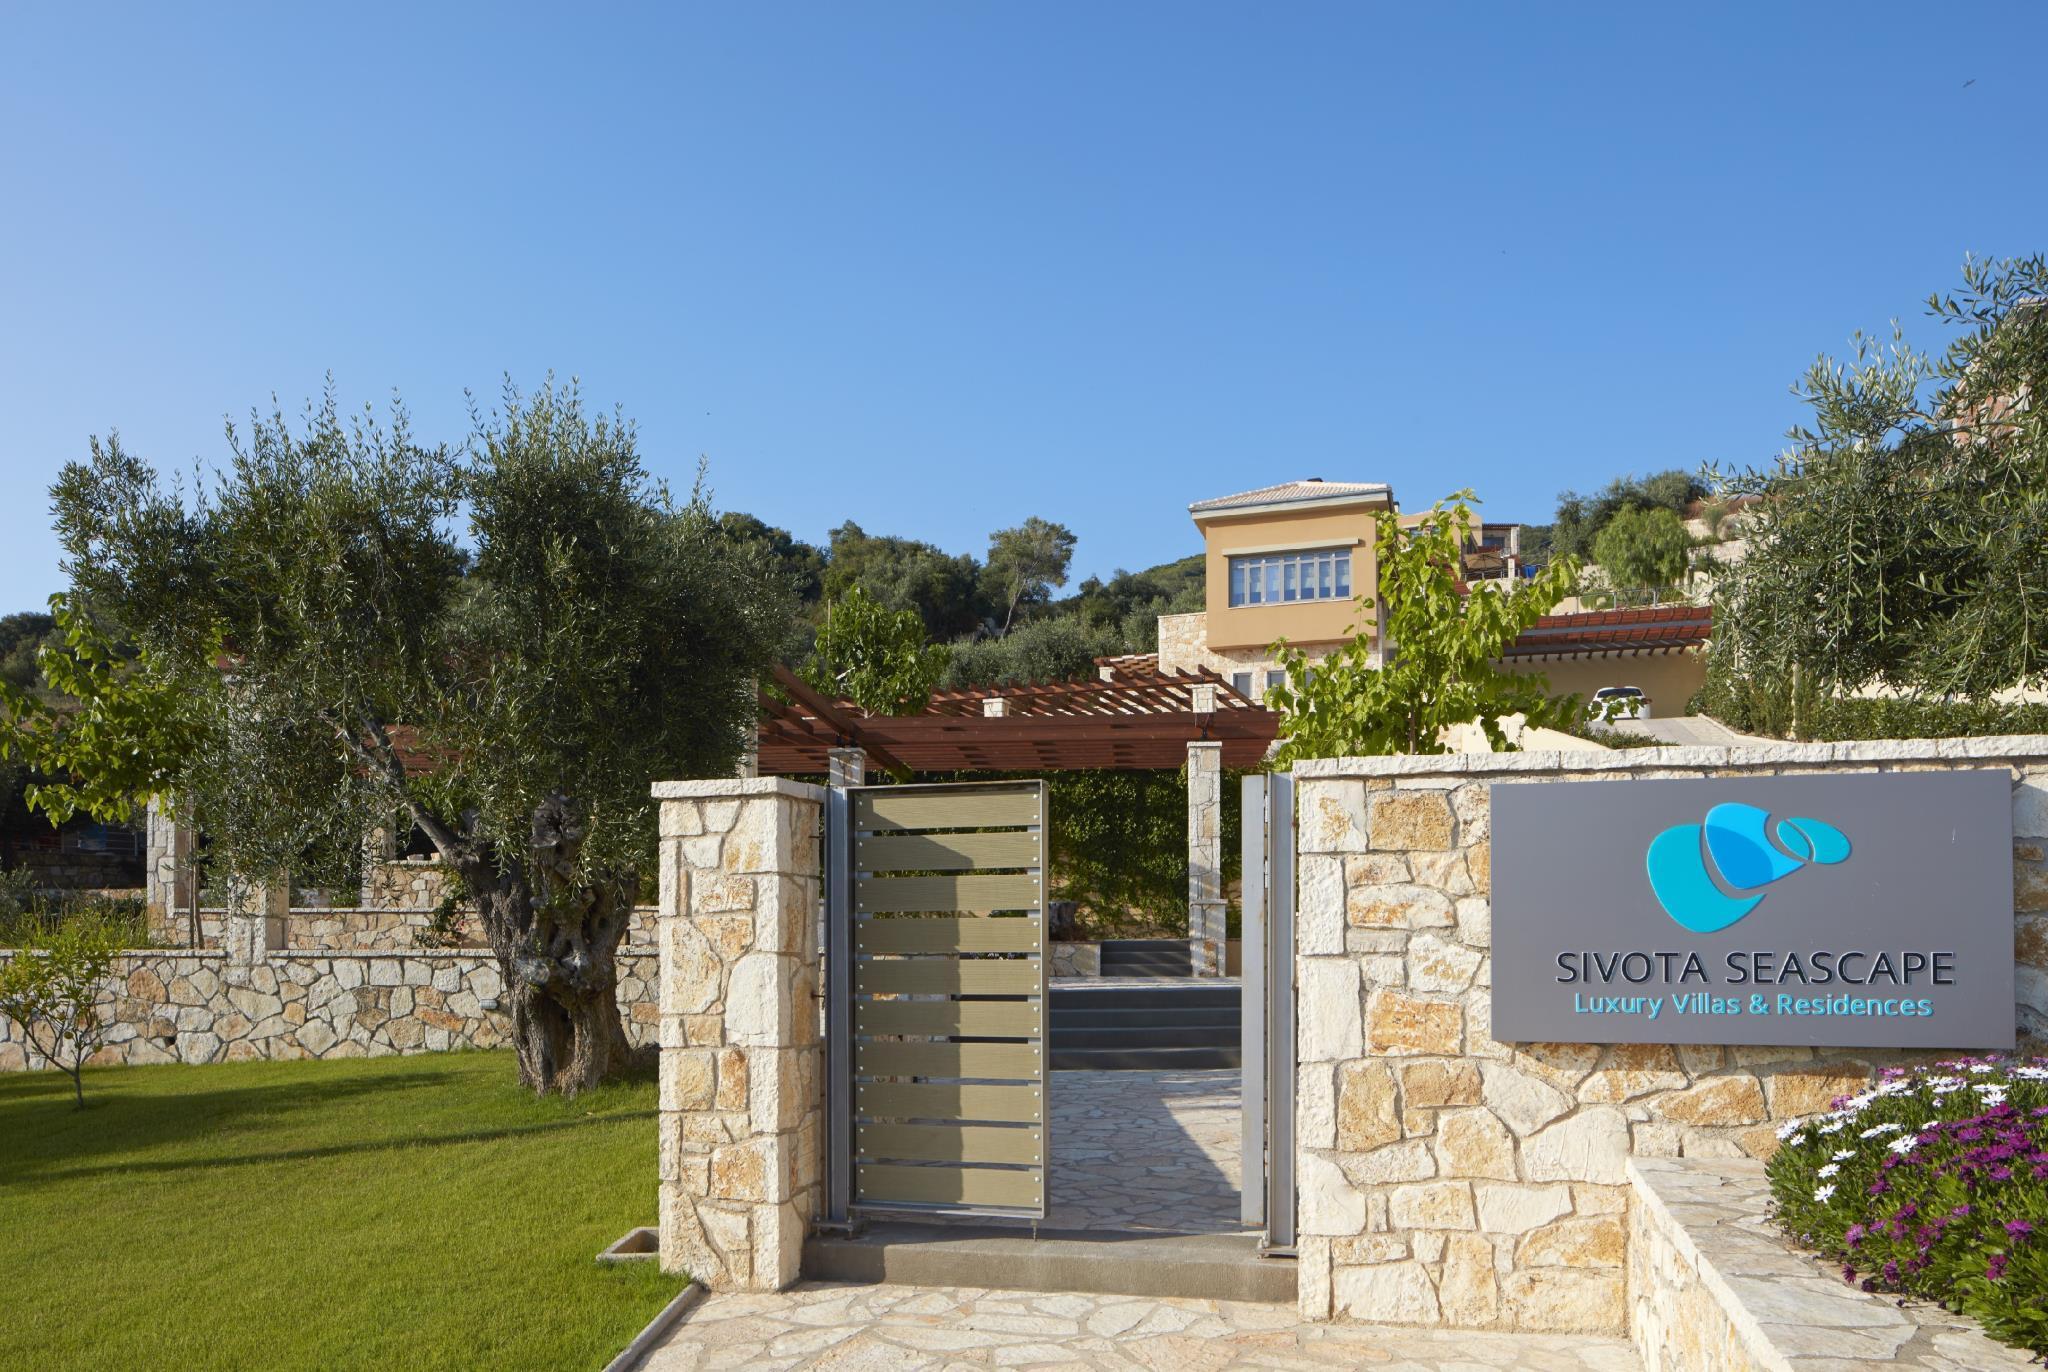 Sivota Seascape Luxury Villas And Residences